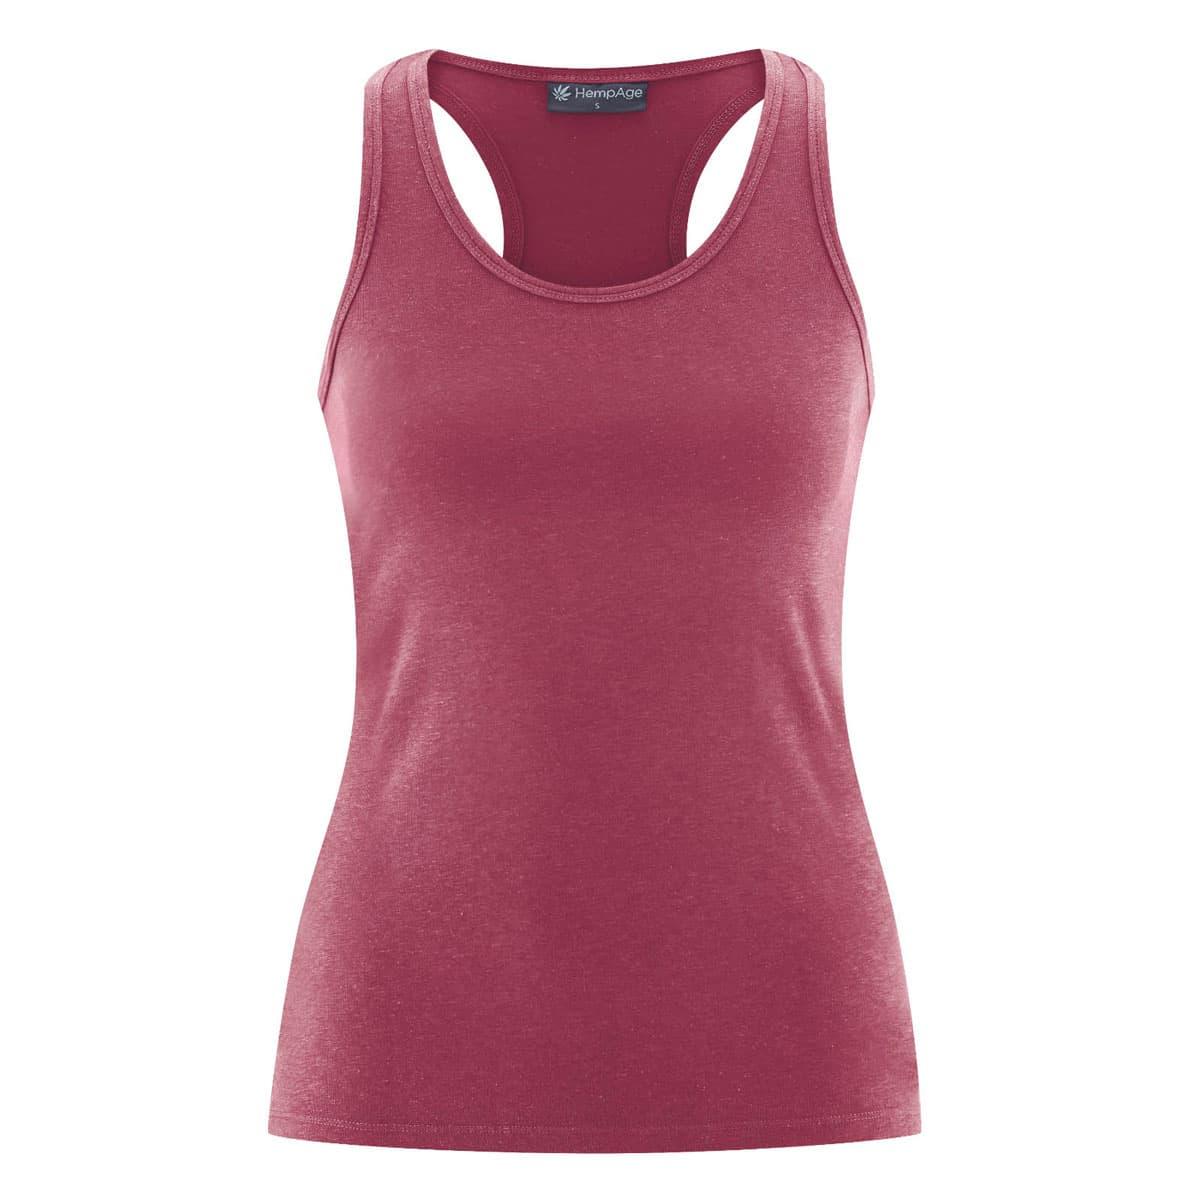 Camiseta yoga con tirantes burdeos frente